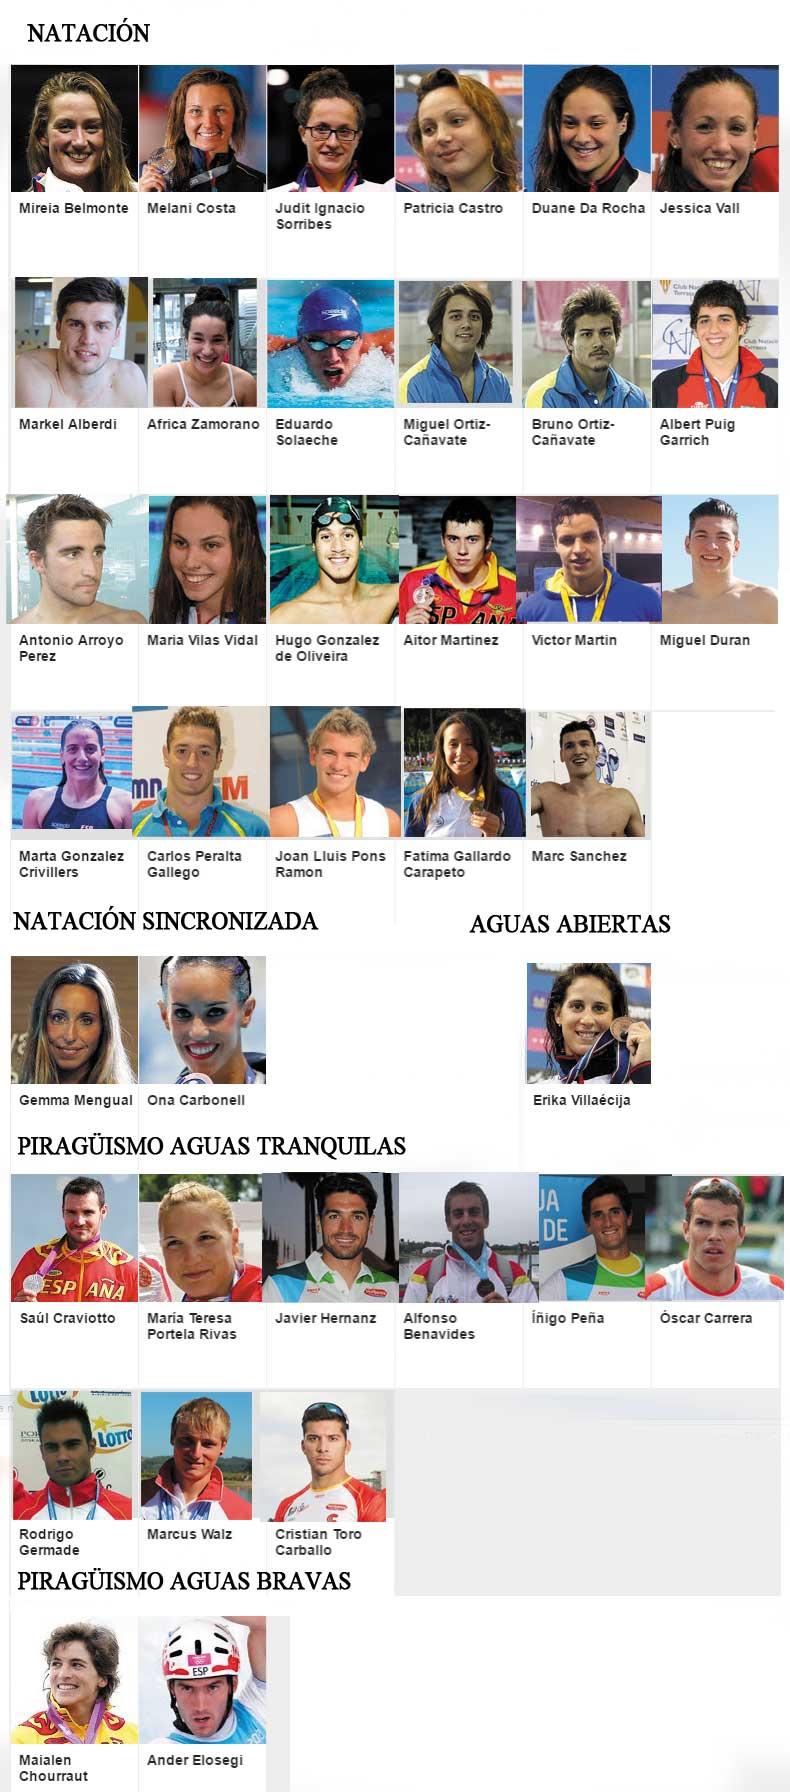 olimpicos-spain-rio-2016-natacion-piraguismo-avance-deportivo